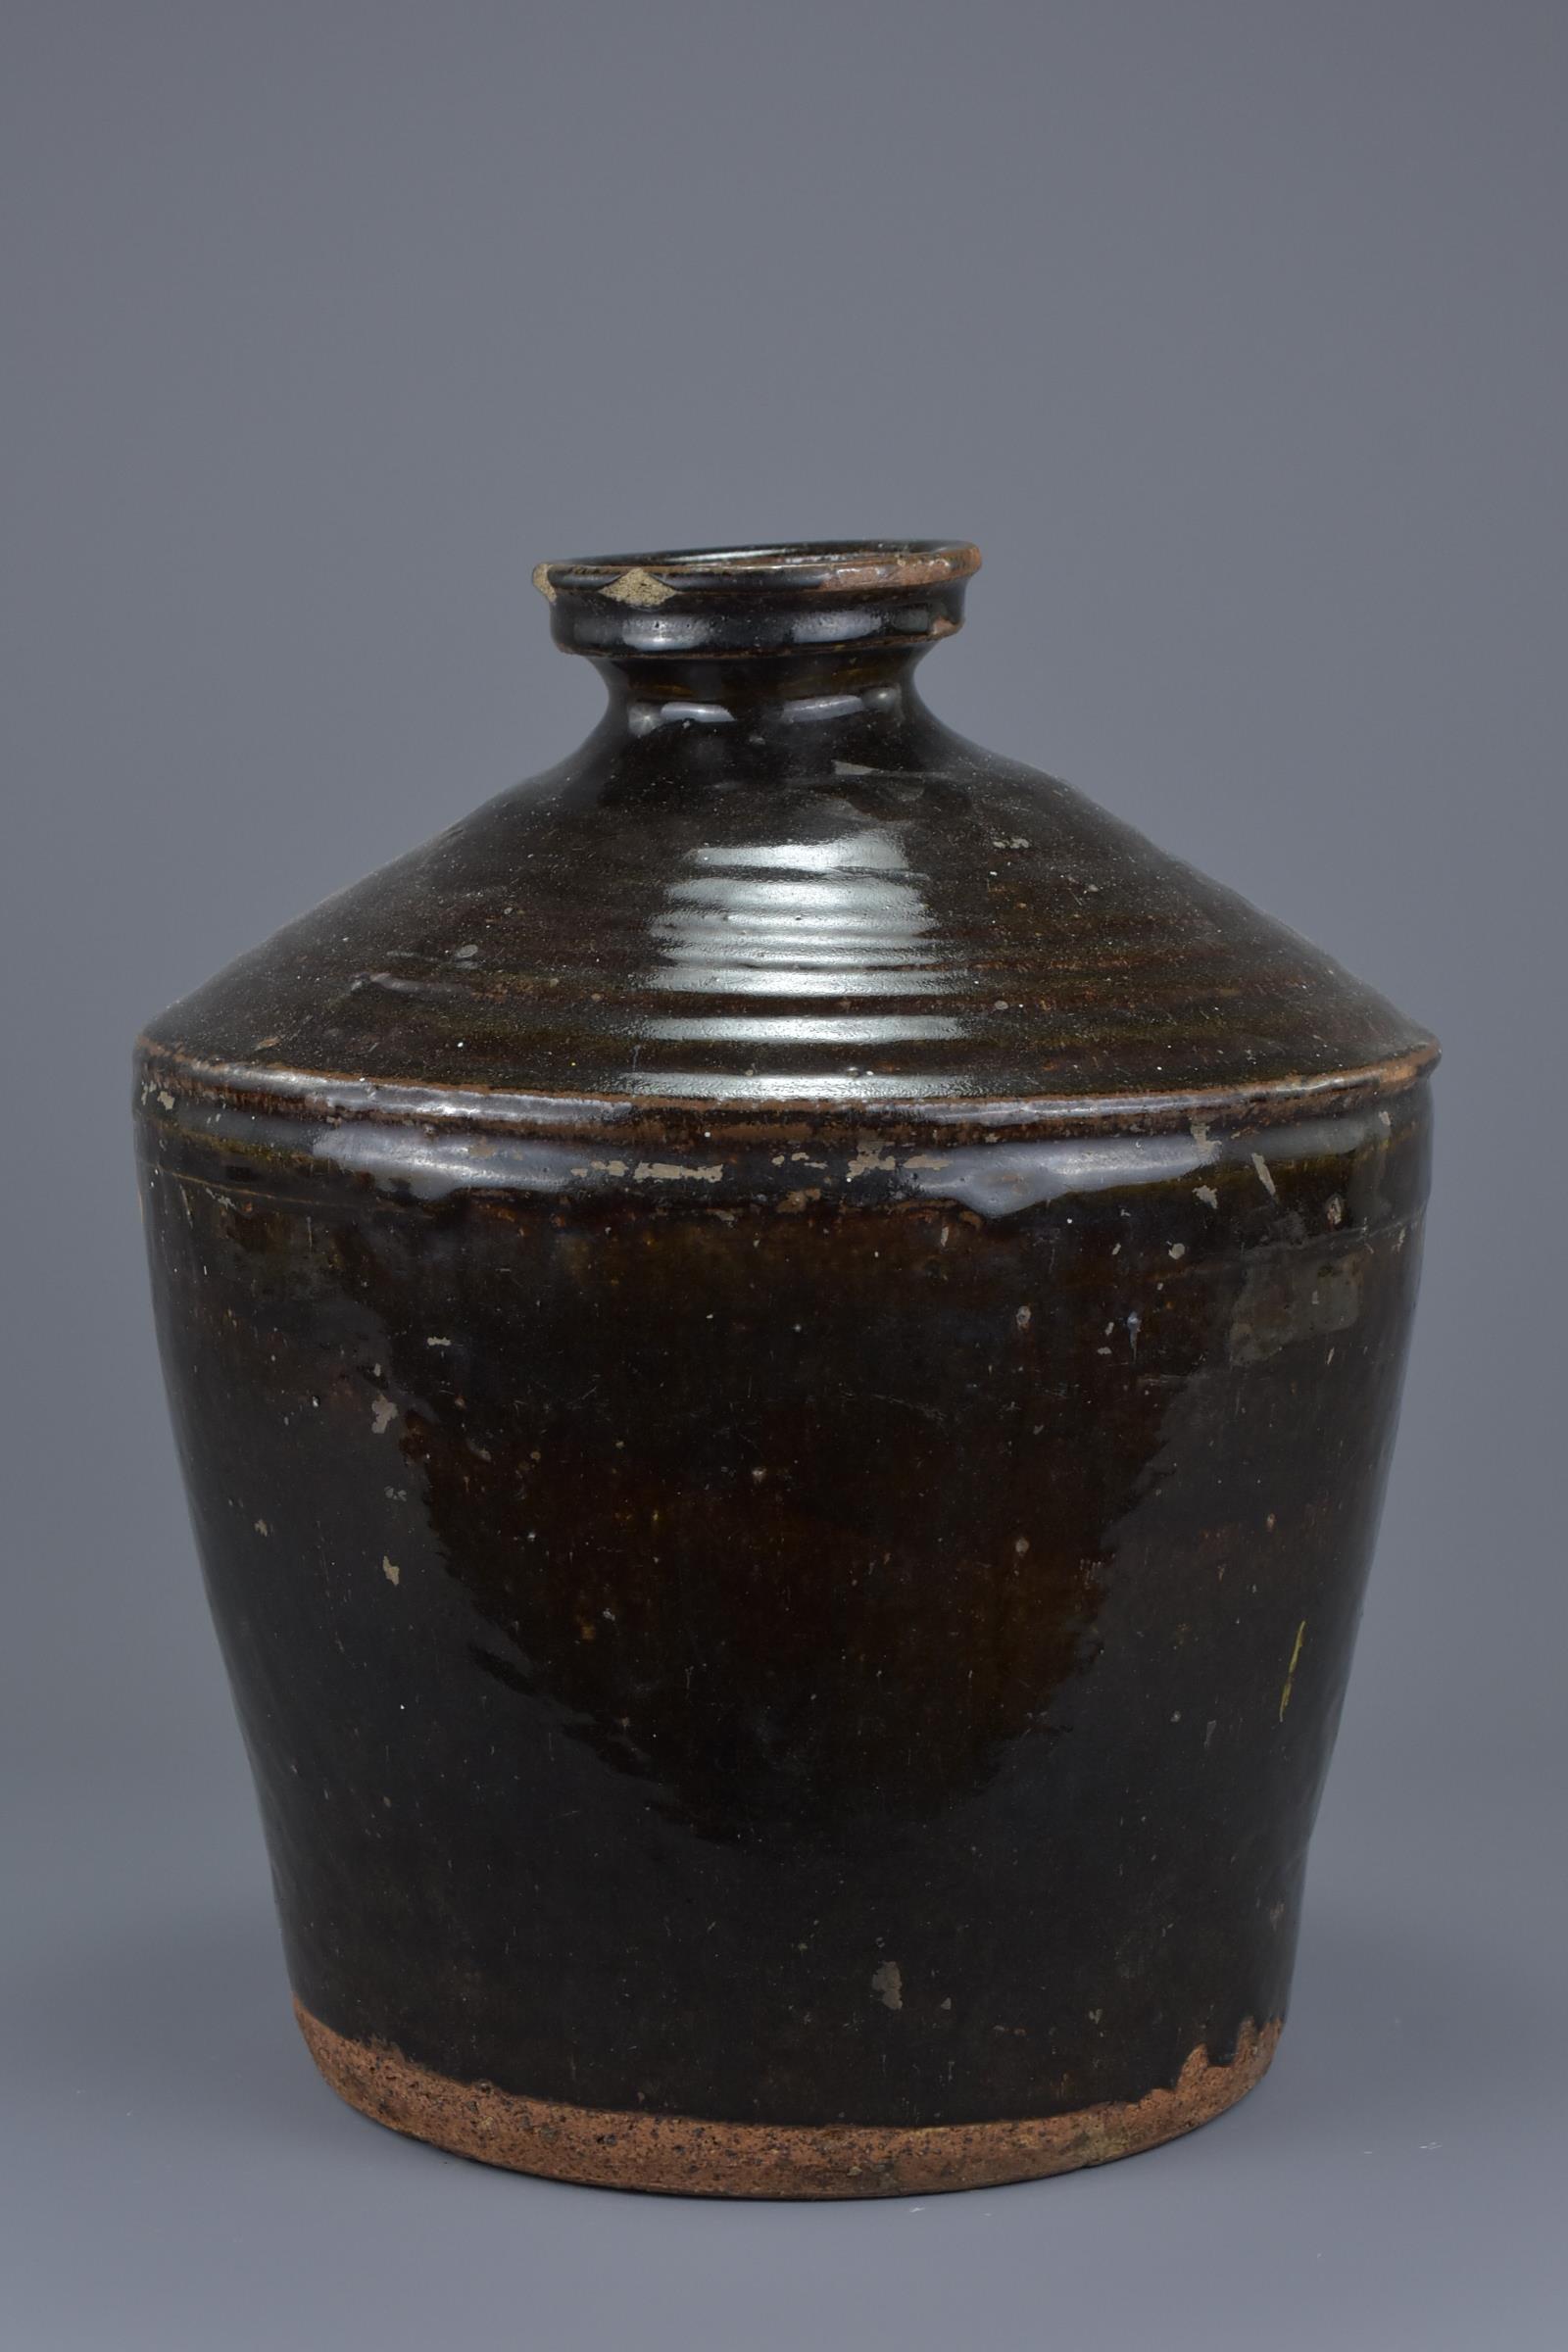 Lot 12 - A Chinese Yuan / Ming Dynasty Henan Glazed Stoneware Jar